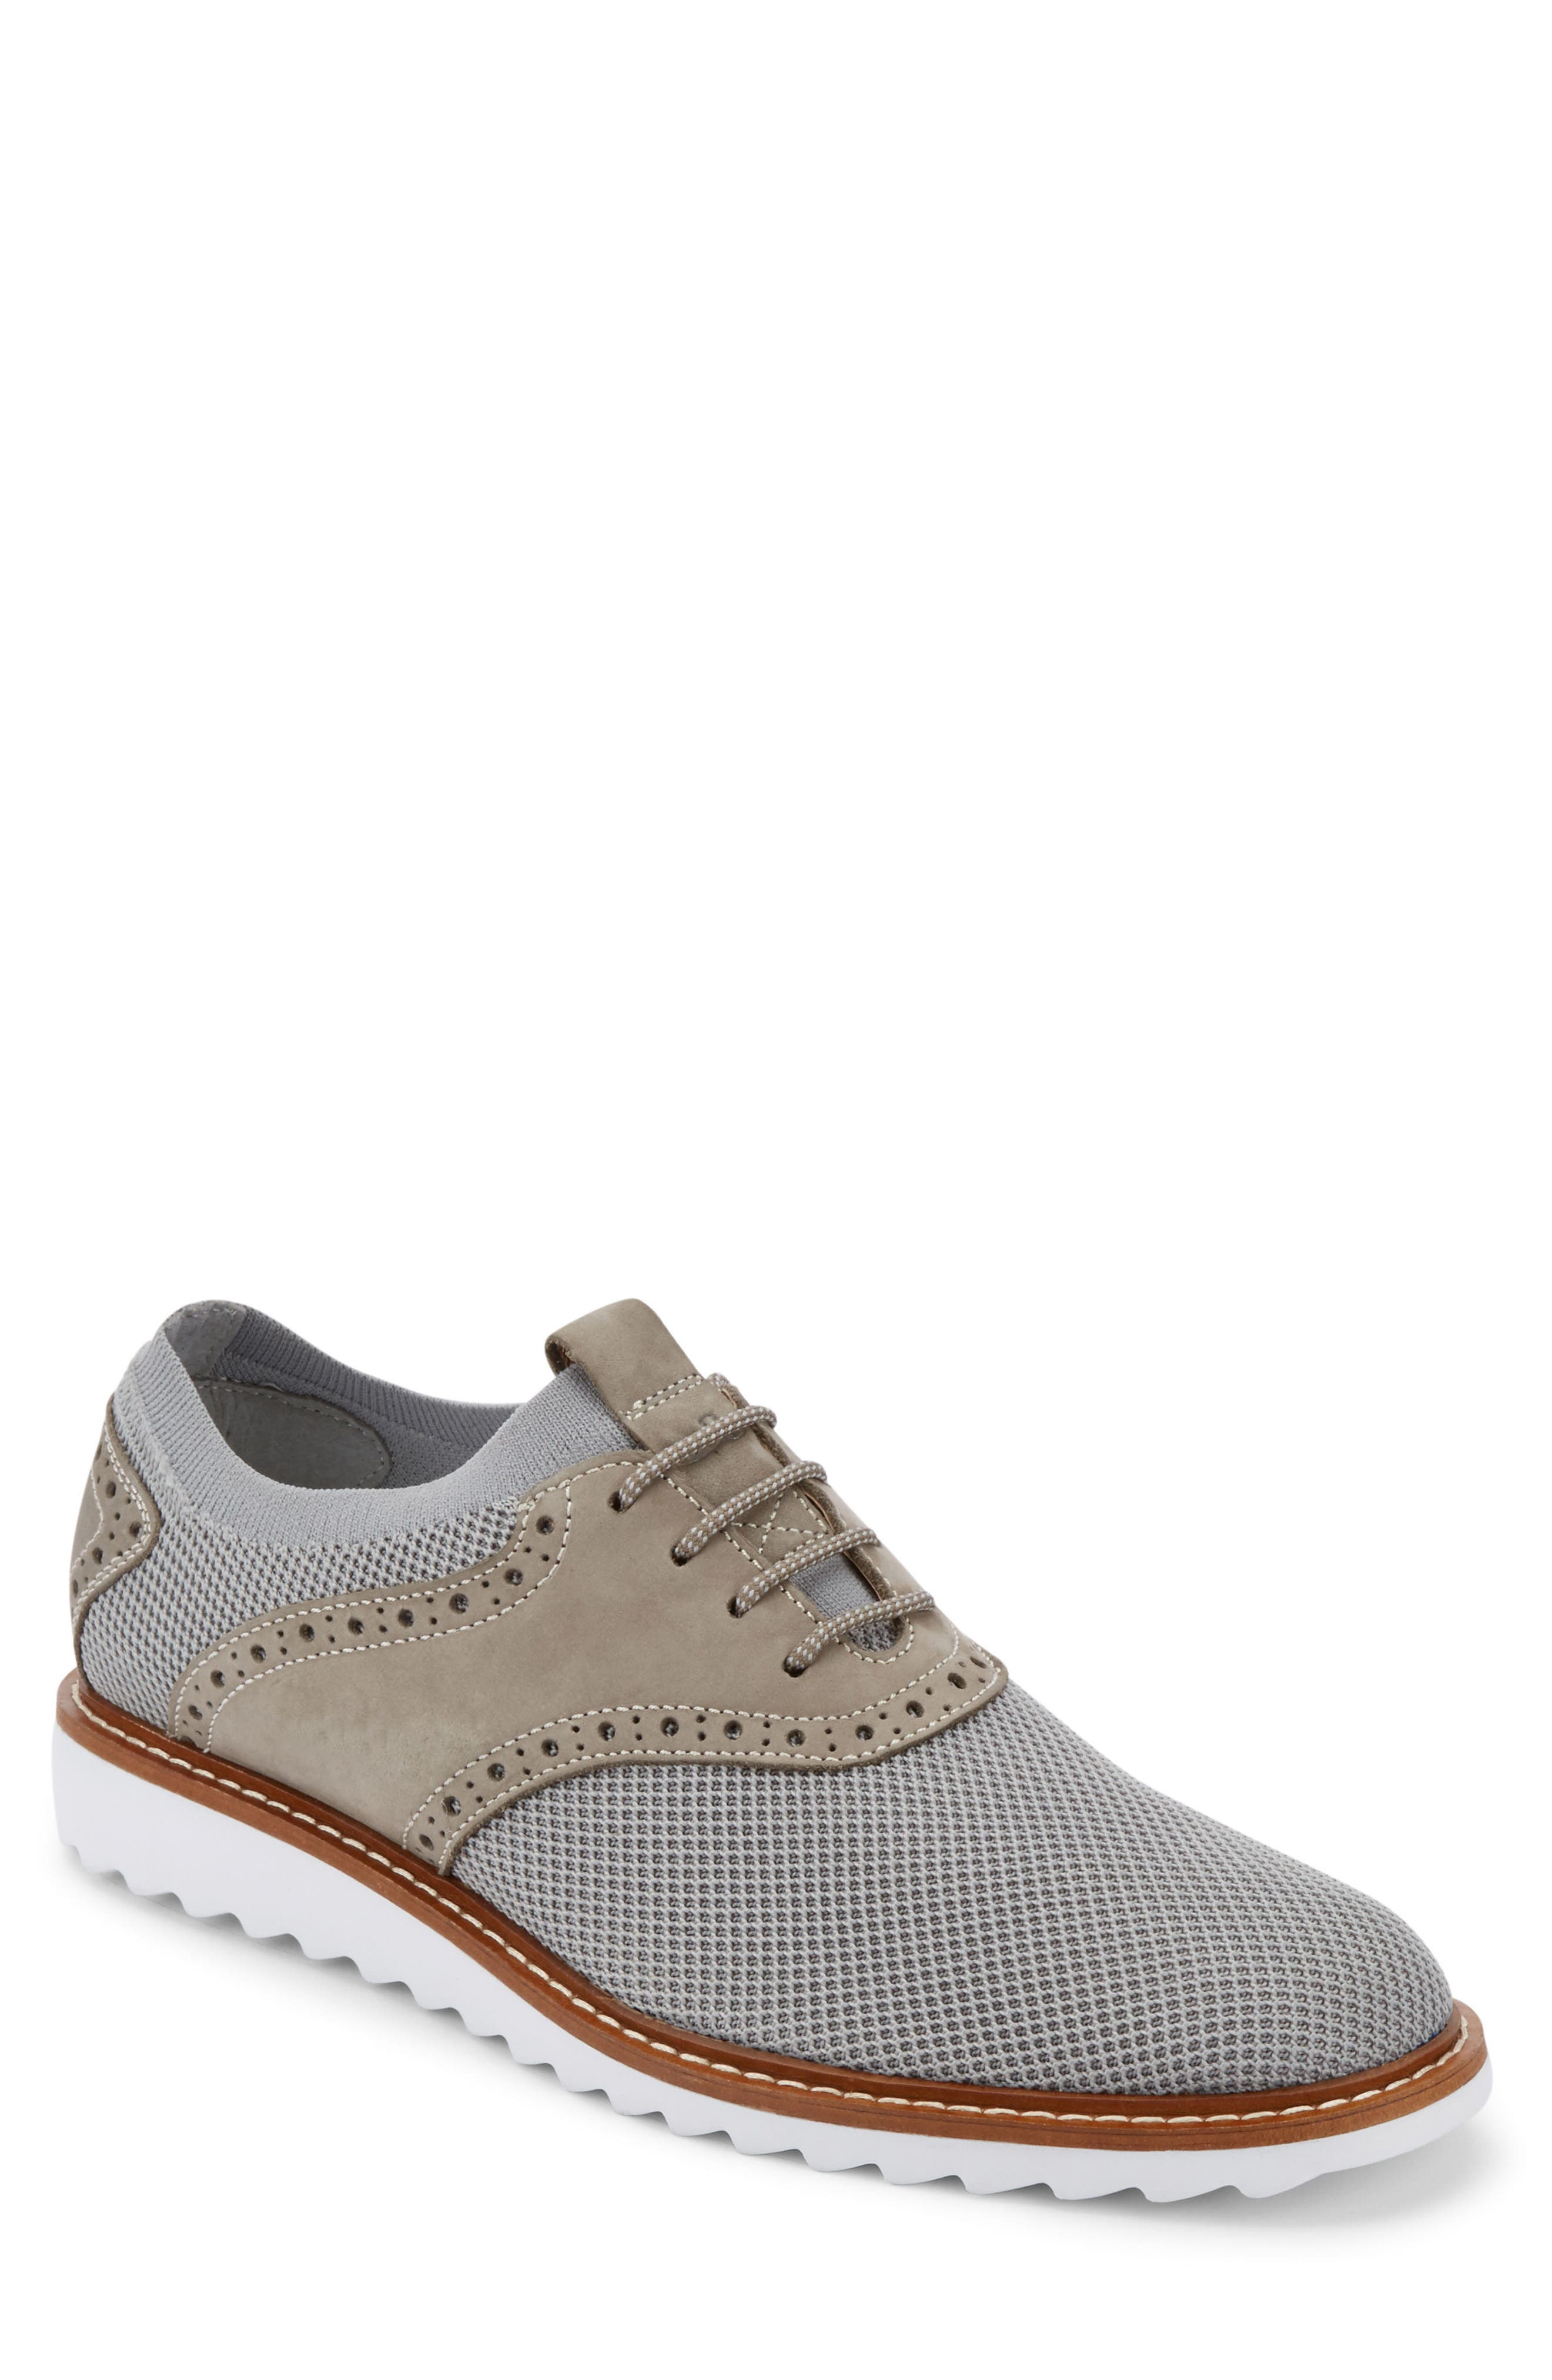 Buck 2.0 Saddle Shoe,                         Main,                         color, Light Grey Knit/ Nubuck